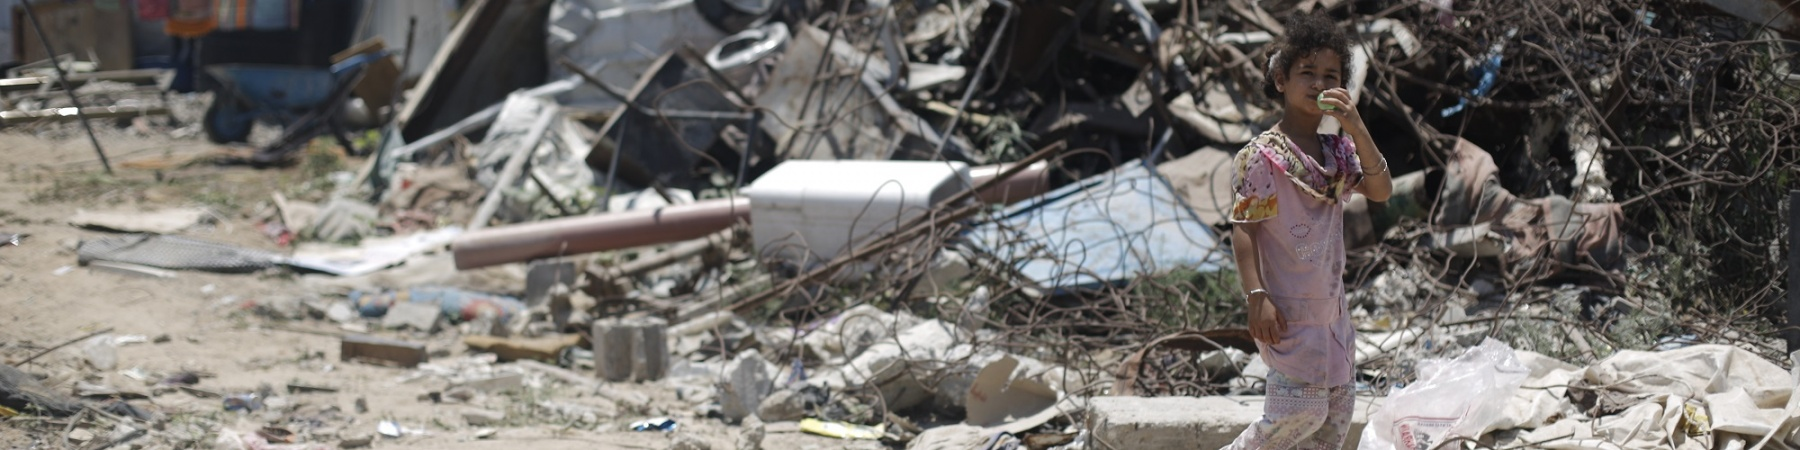 Gaza bambina tra le macerie